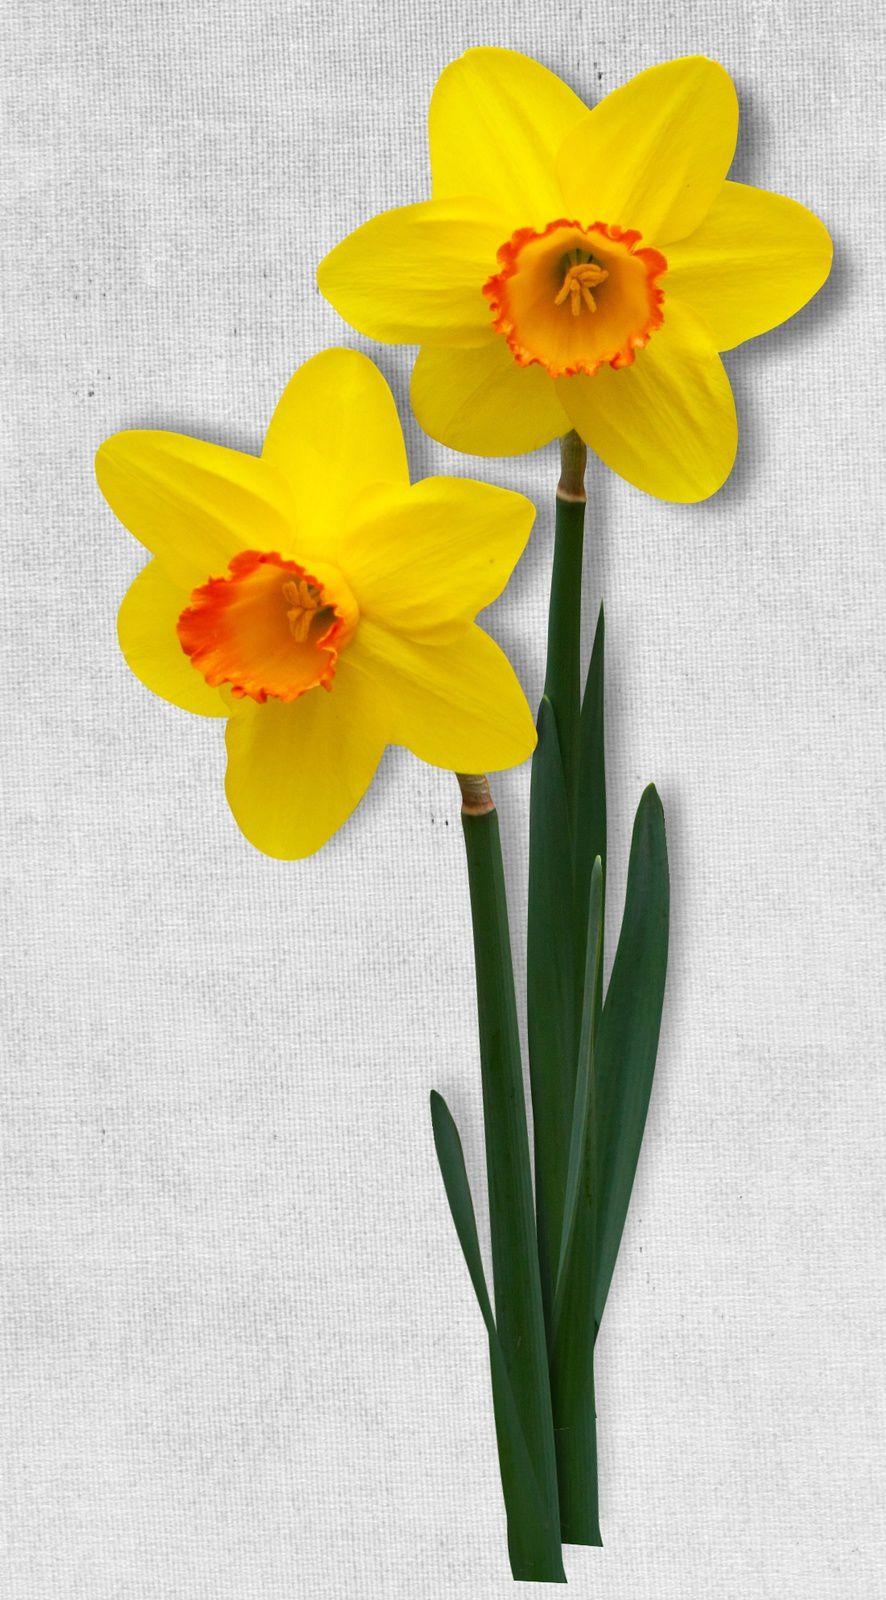 Fleur-Jaune-Narcisse-Jonquille-